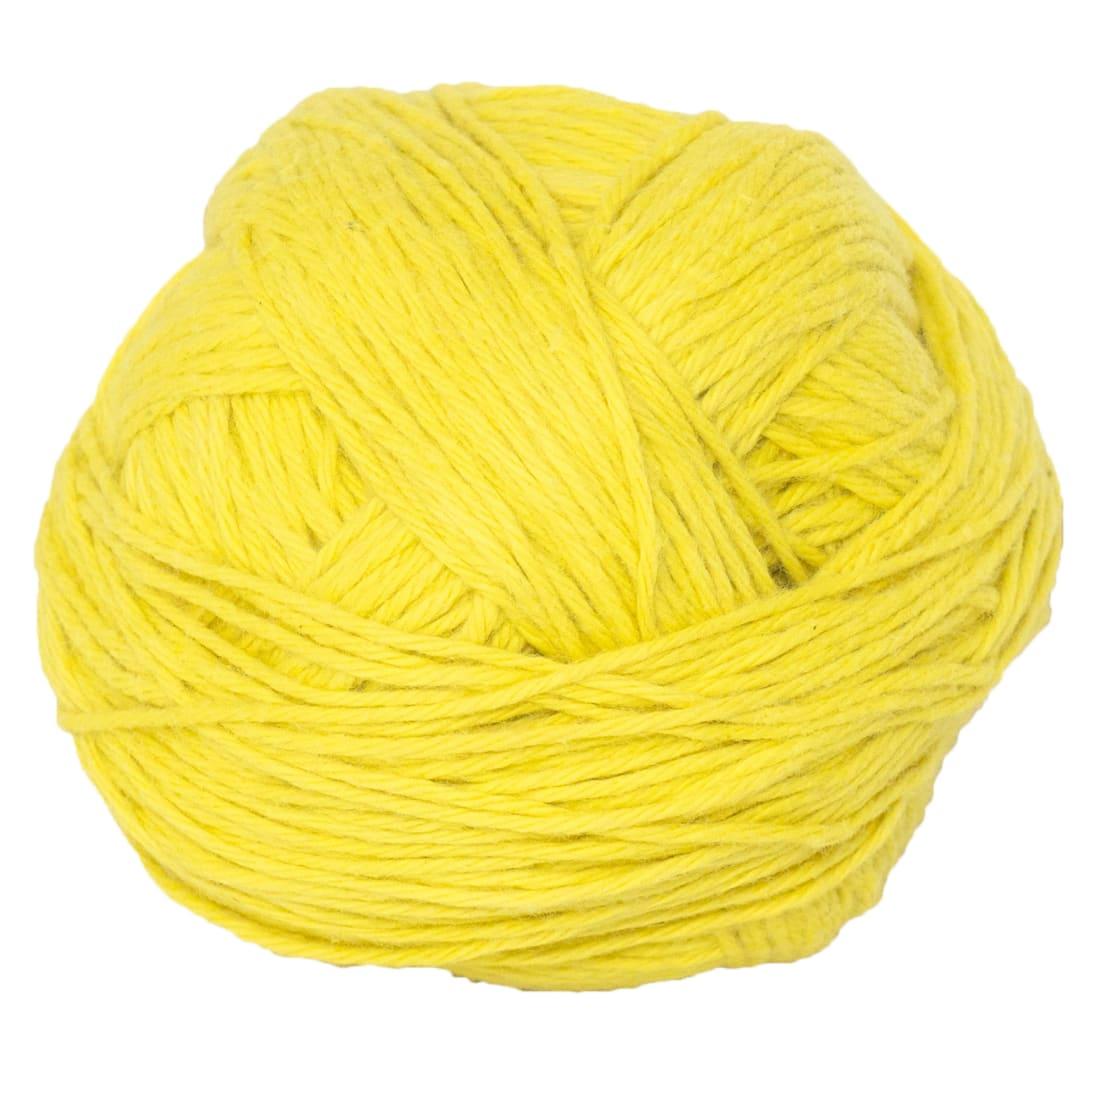 YOG202F Yellow